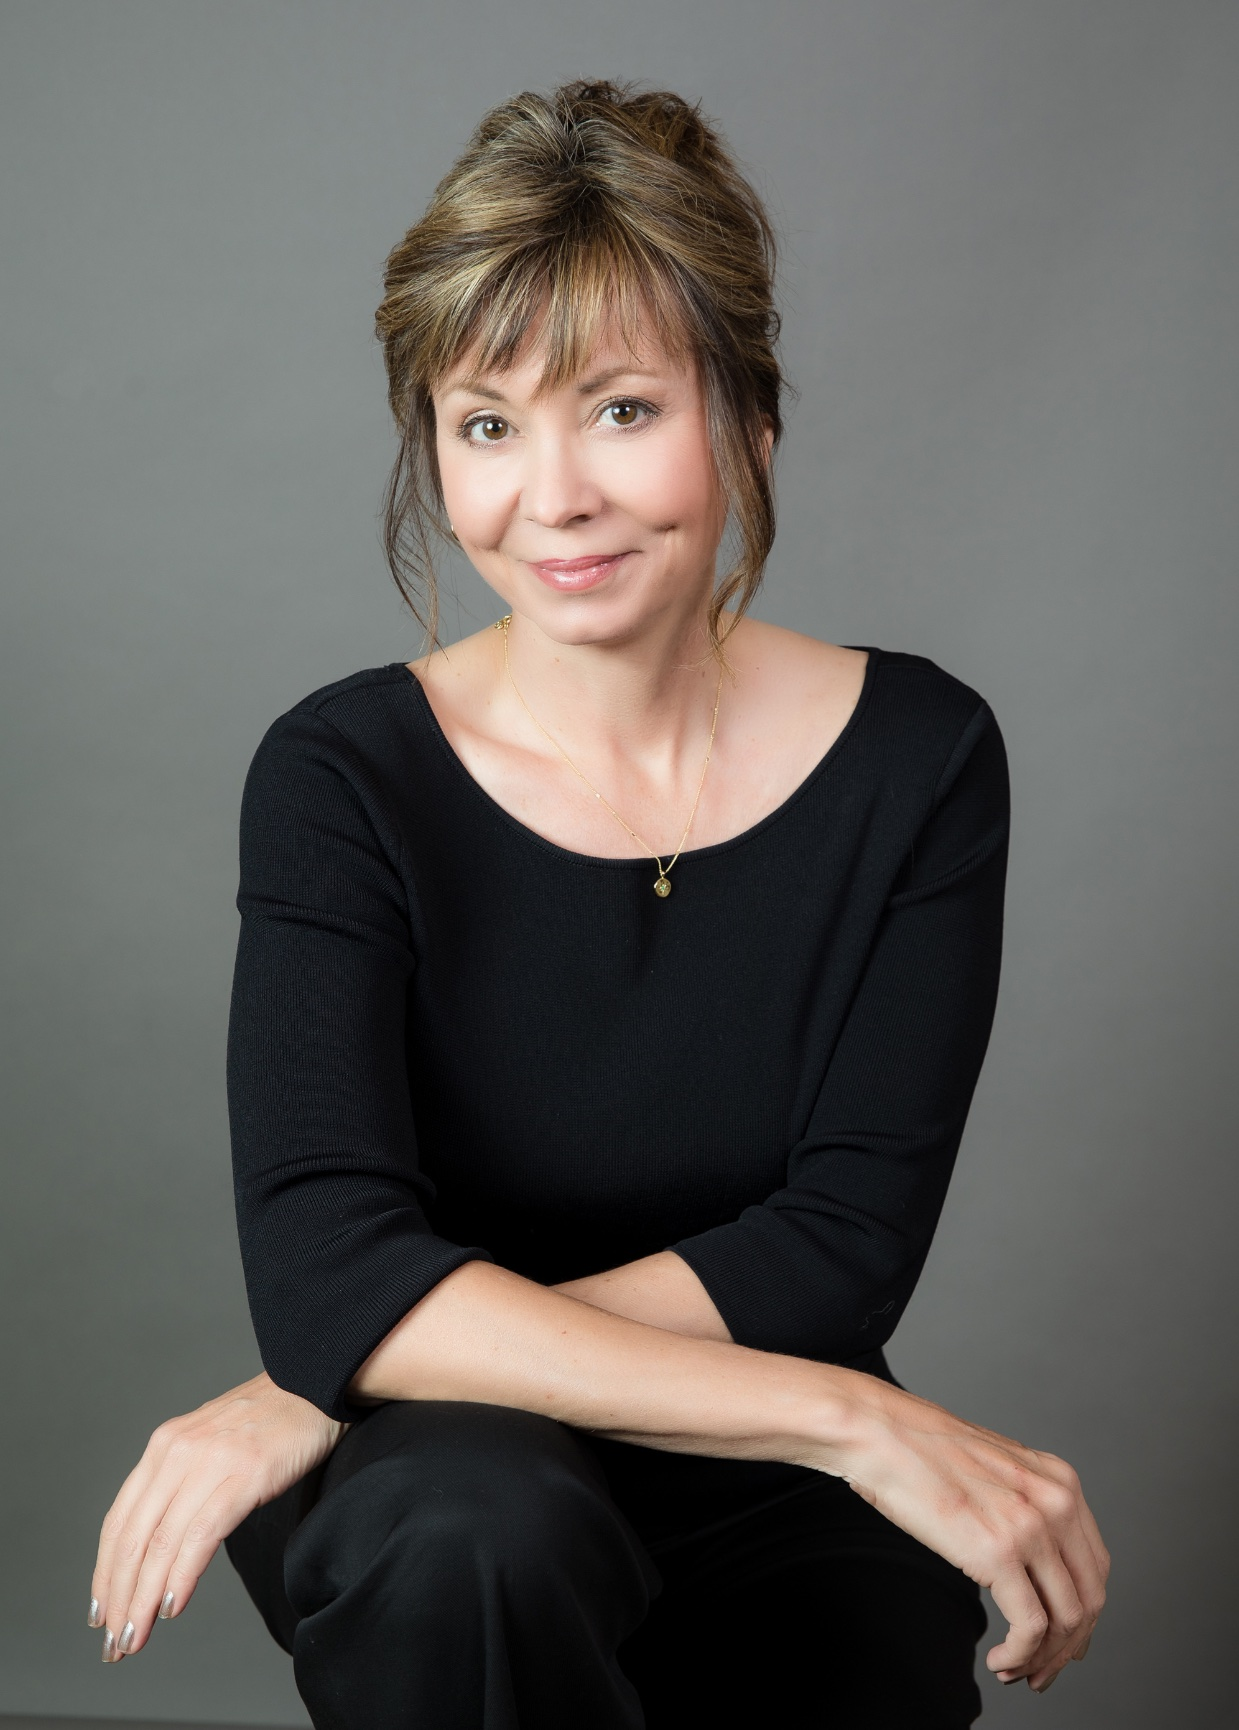 Sabrina Stratford